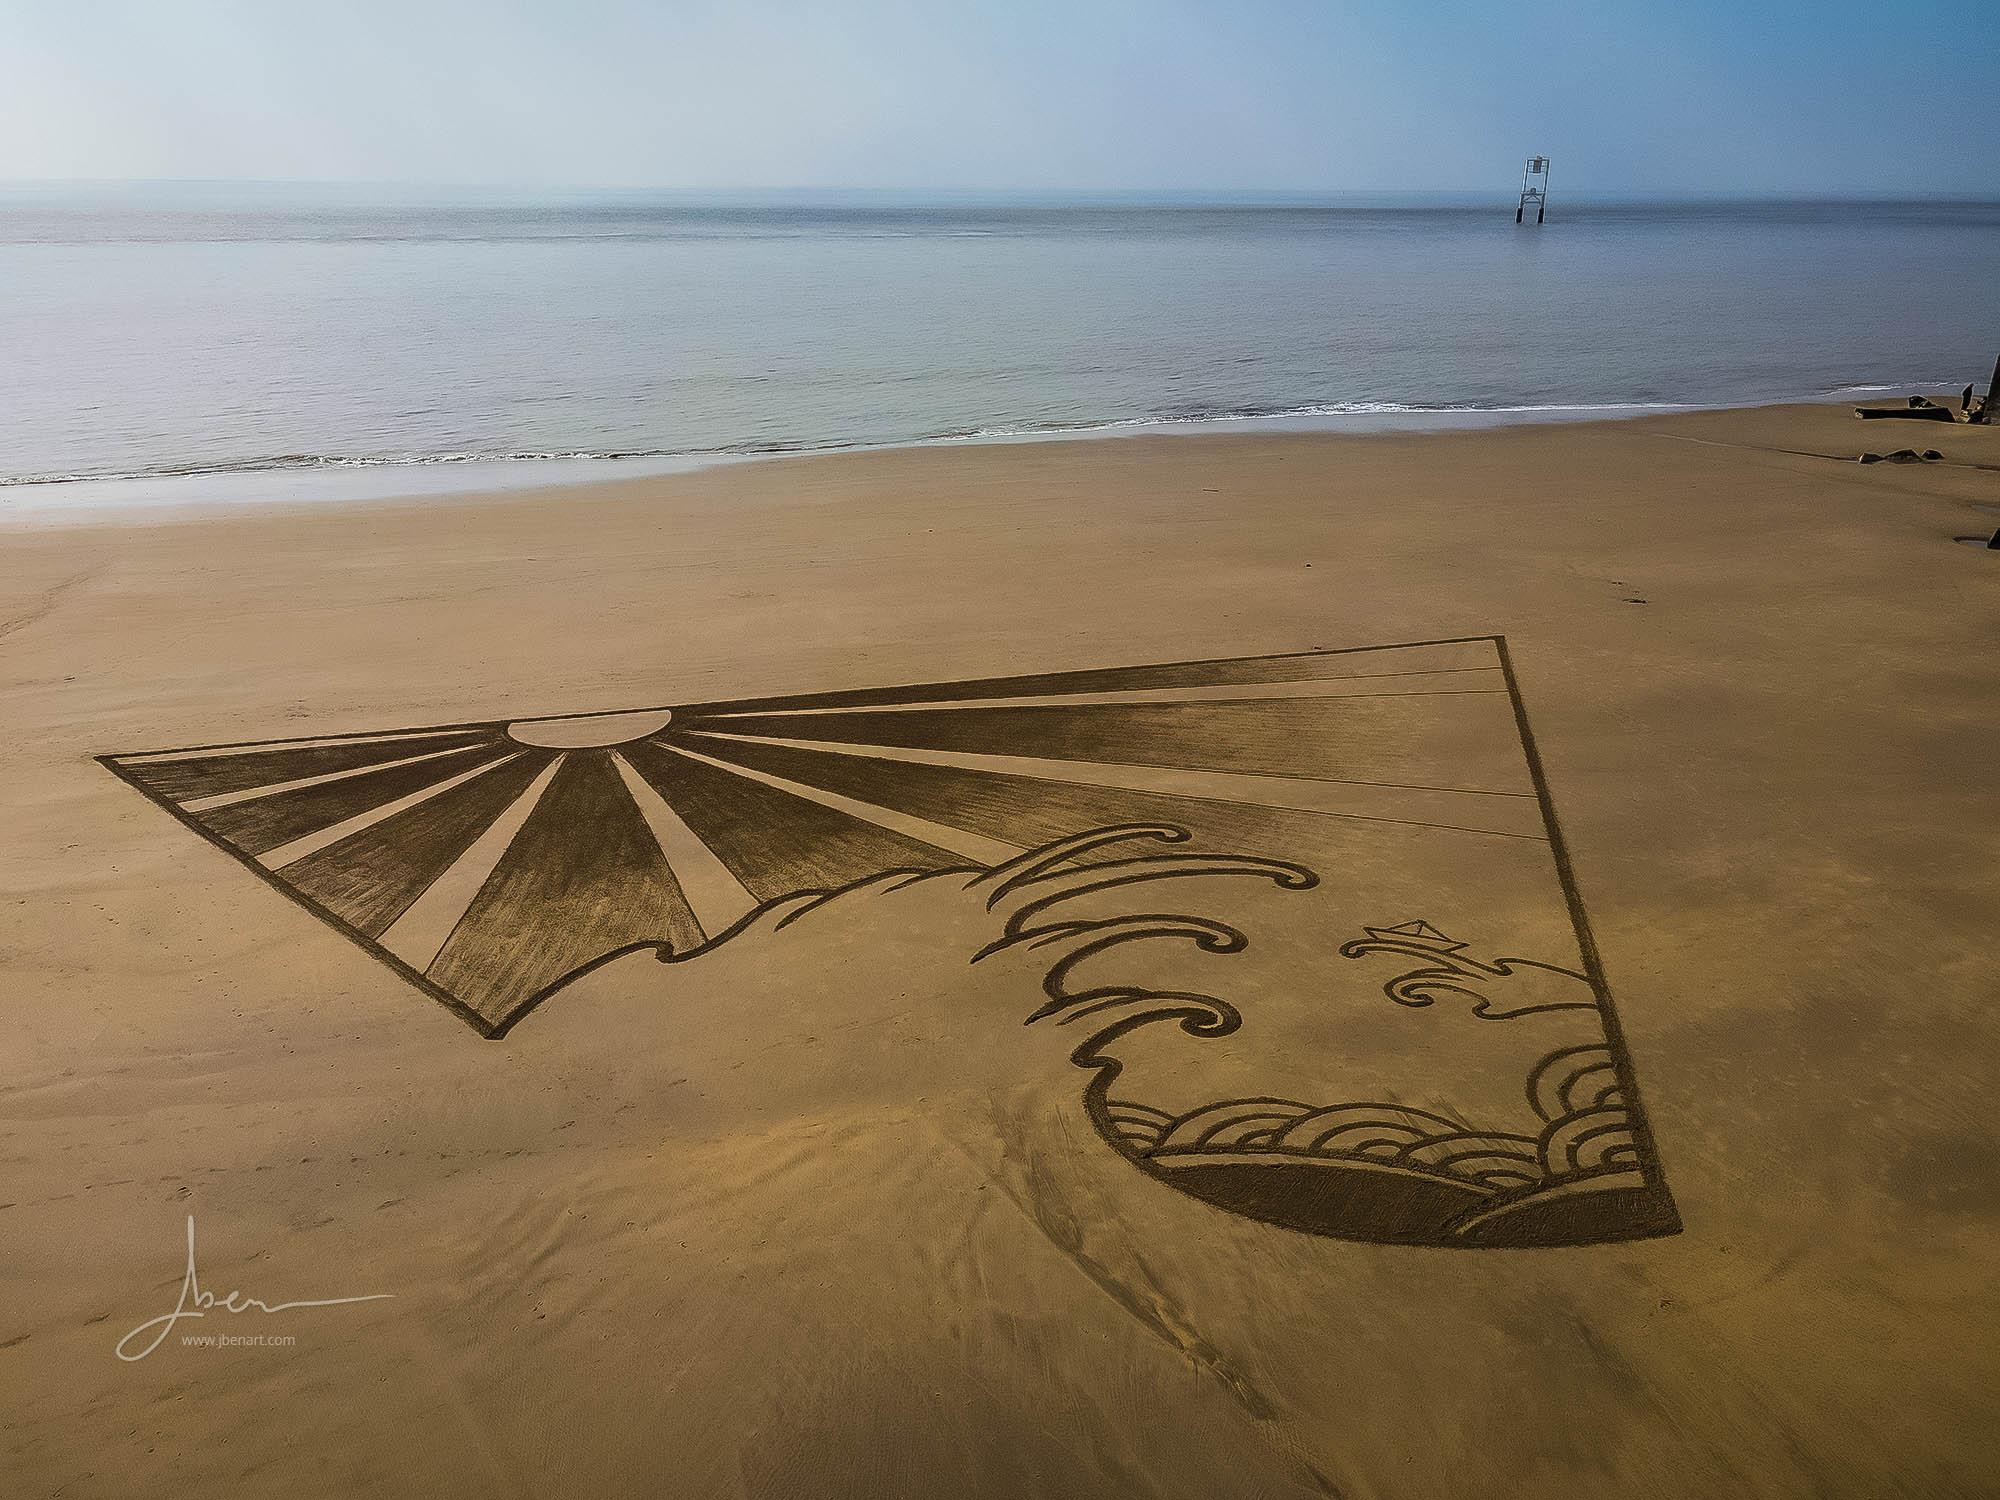 Beach art triangle wave